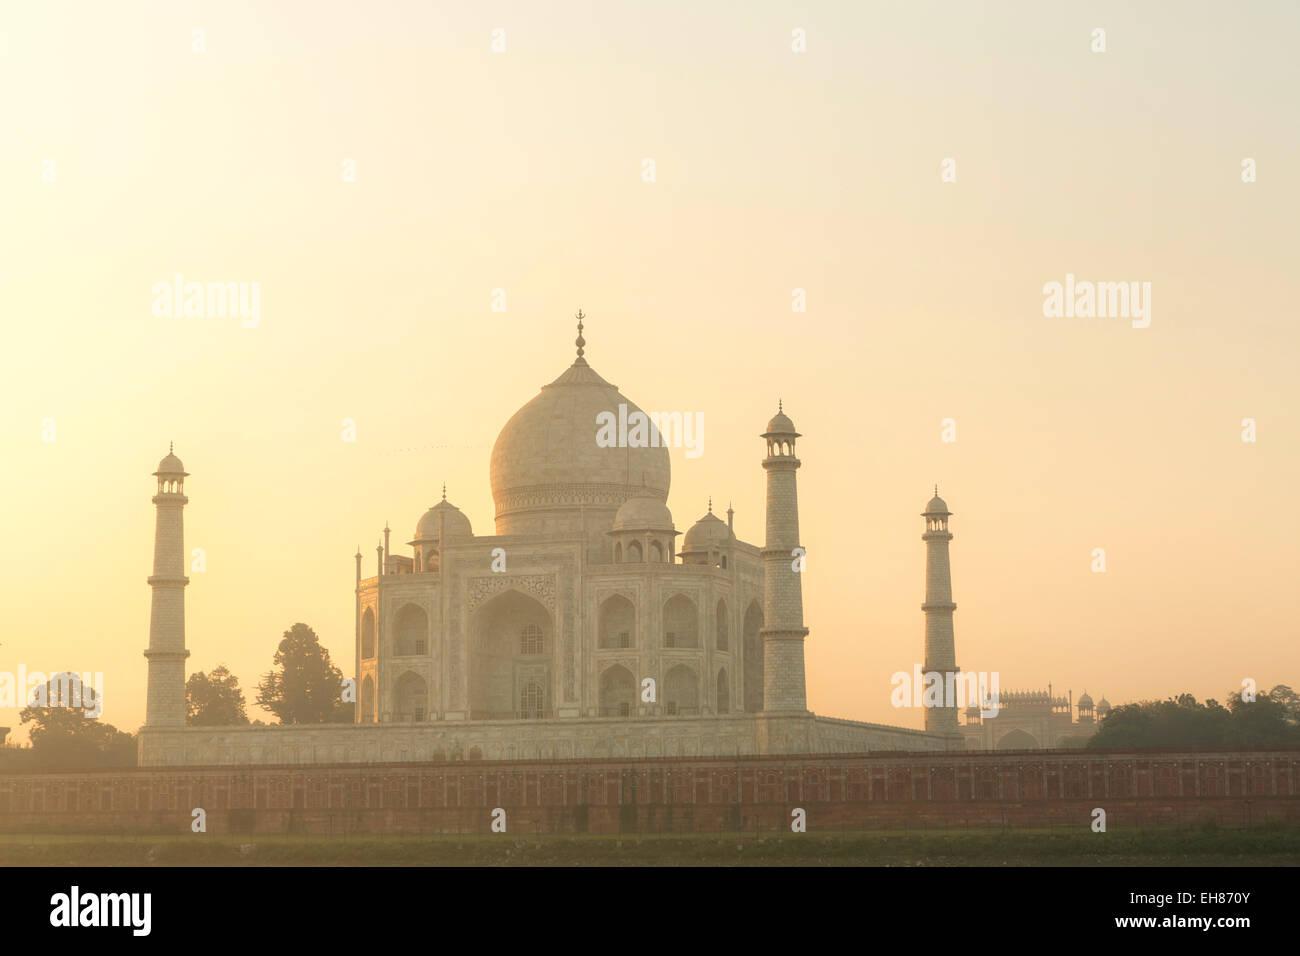 Taj Mahal Wall Arts Stock Photos & Taj Mahal Wall Arts Stock Images ...